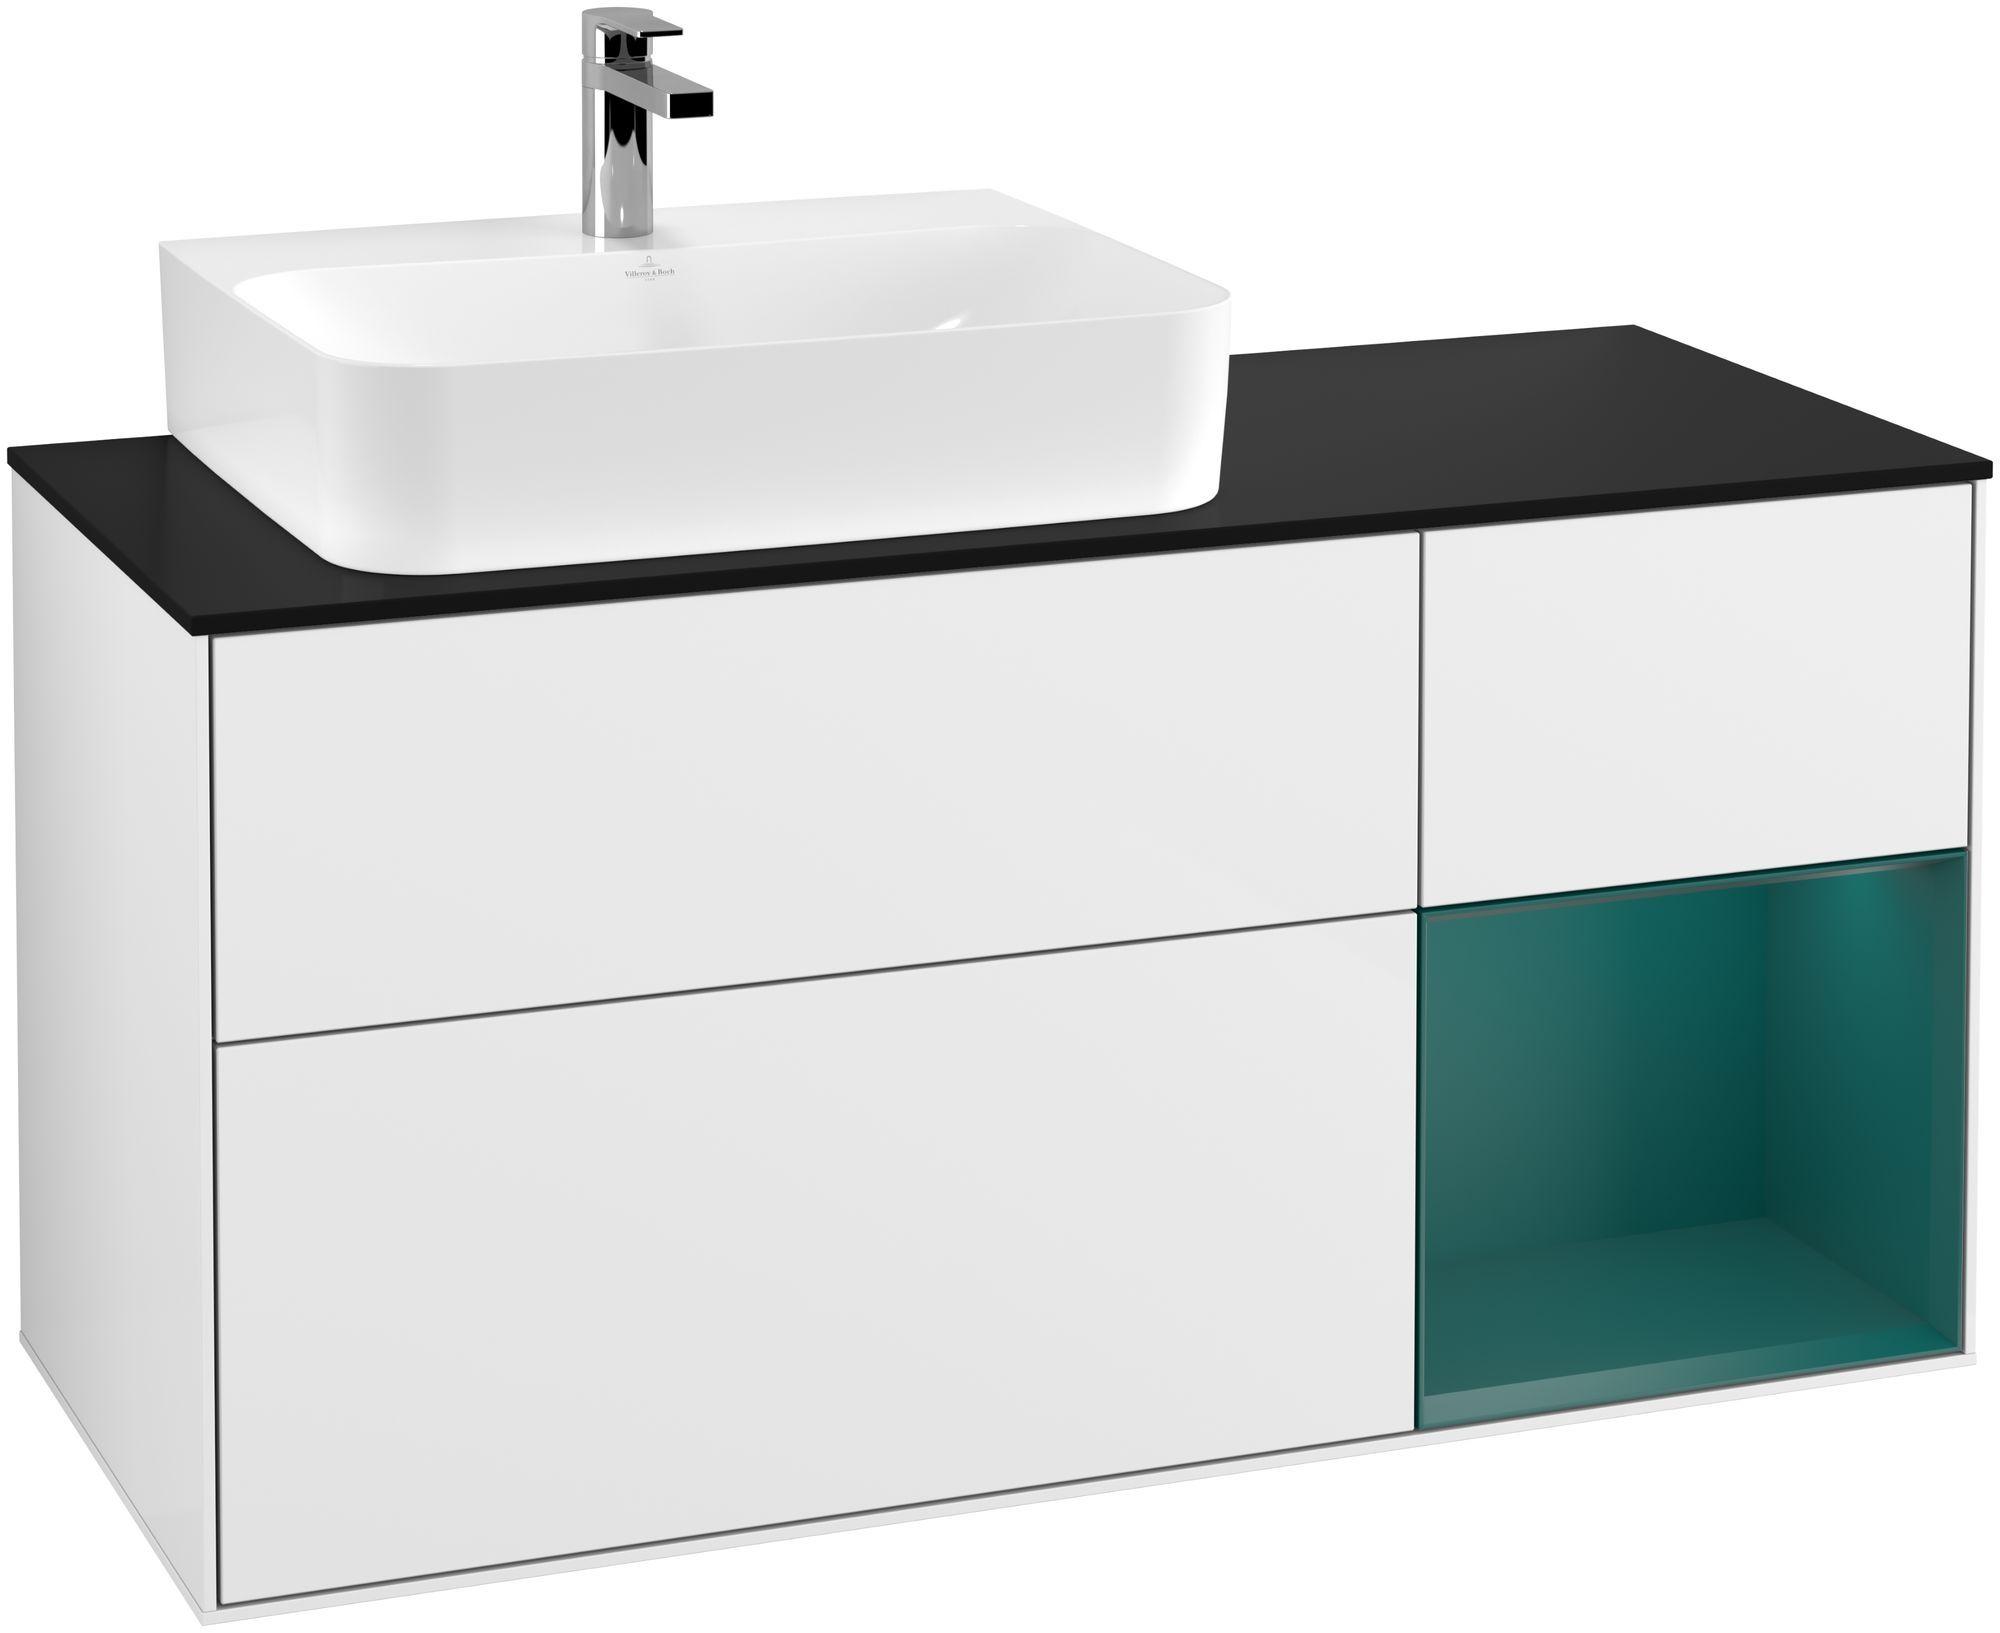 Villeroy & Boch Finion G15 Waschtischunterschrank mit Regalelement 3 Auszüge Waschtisch links LED-Beleuchtung B:120xH:60,3xT:50,1cm Front, Korpus: Glossy White Lack, Regal: Cedar, Glasplatte: Black Matt G152GSGF